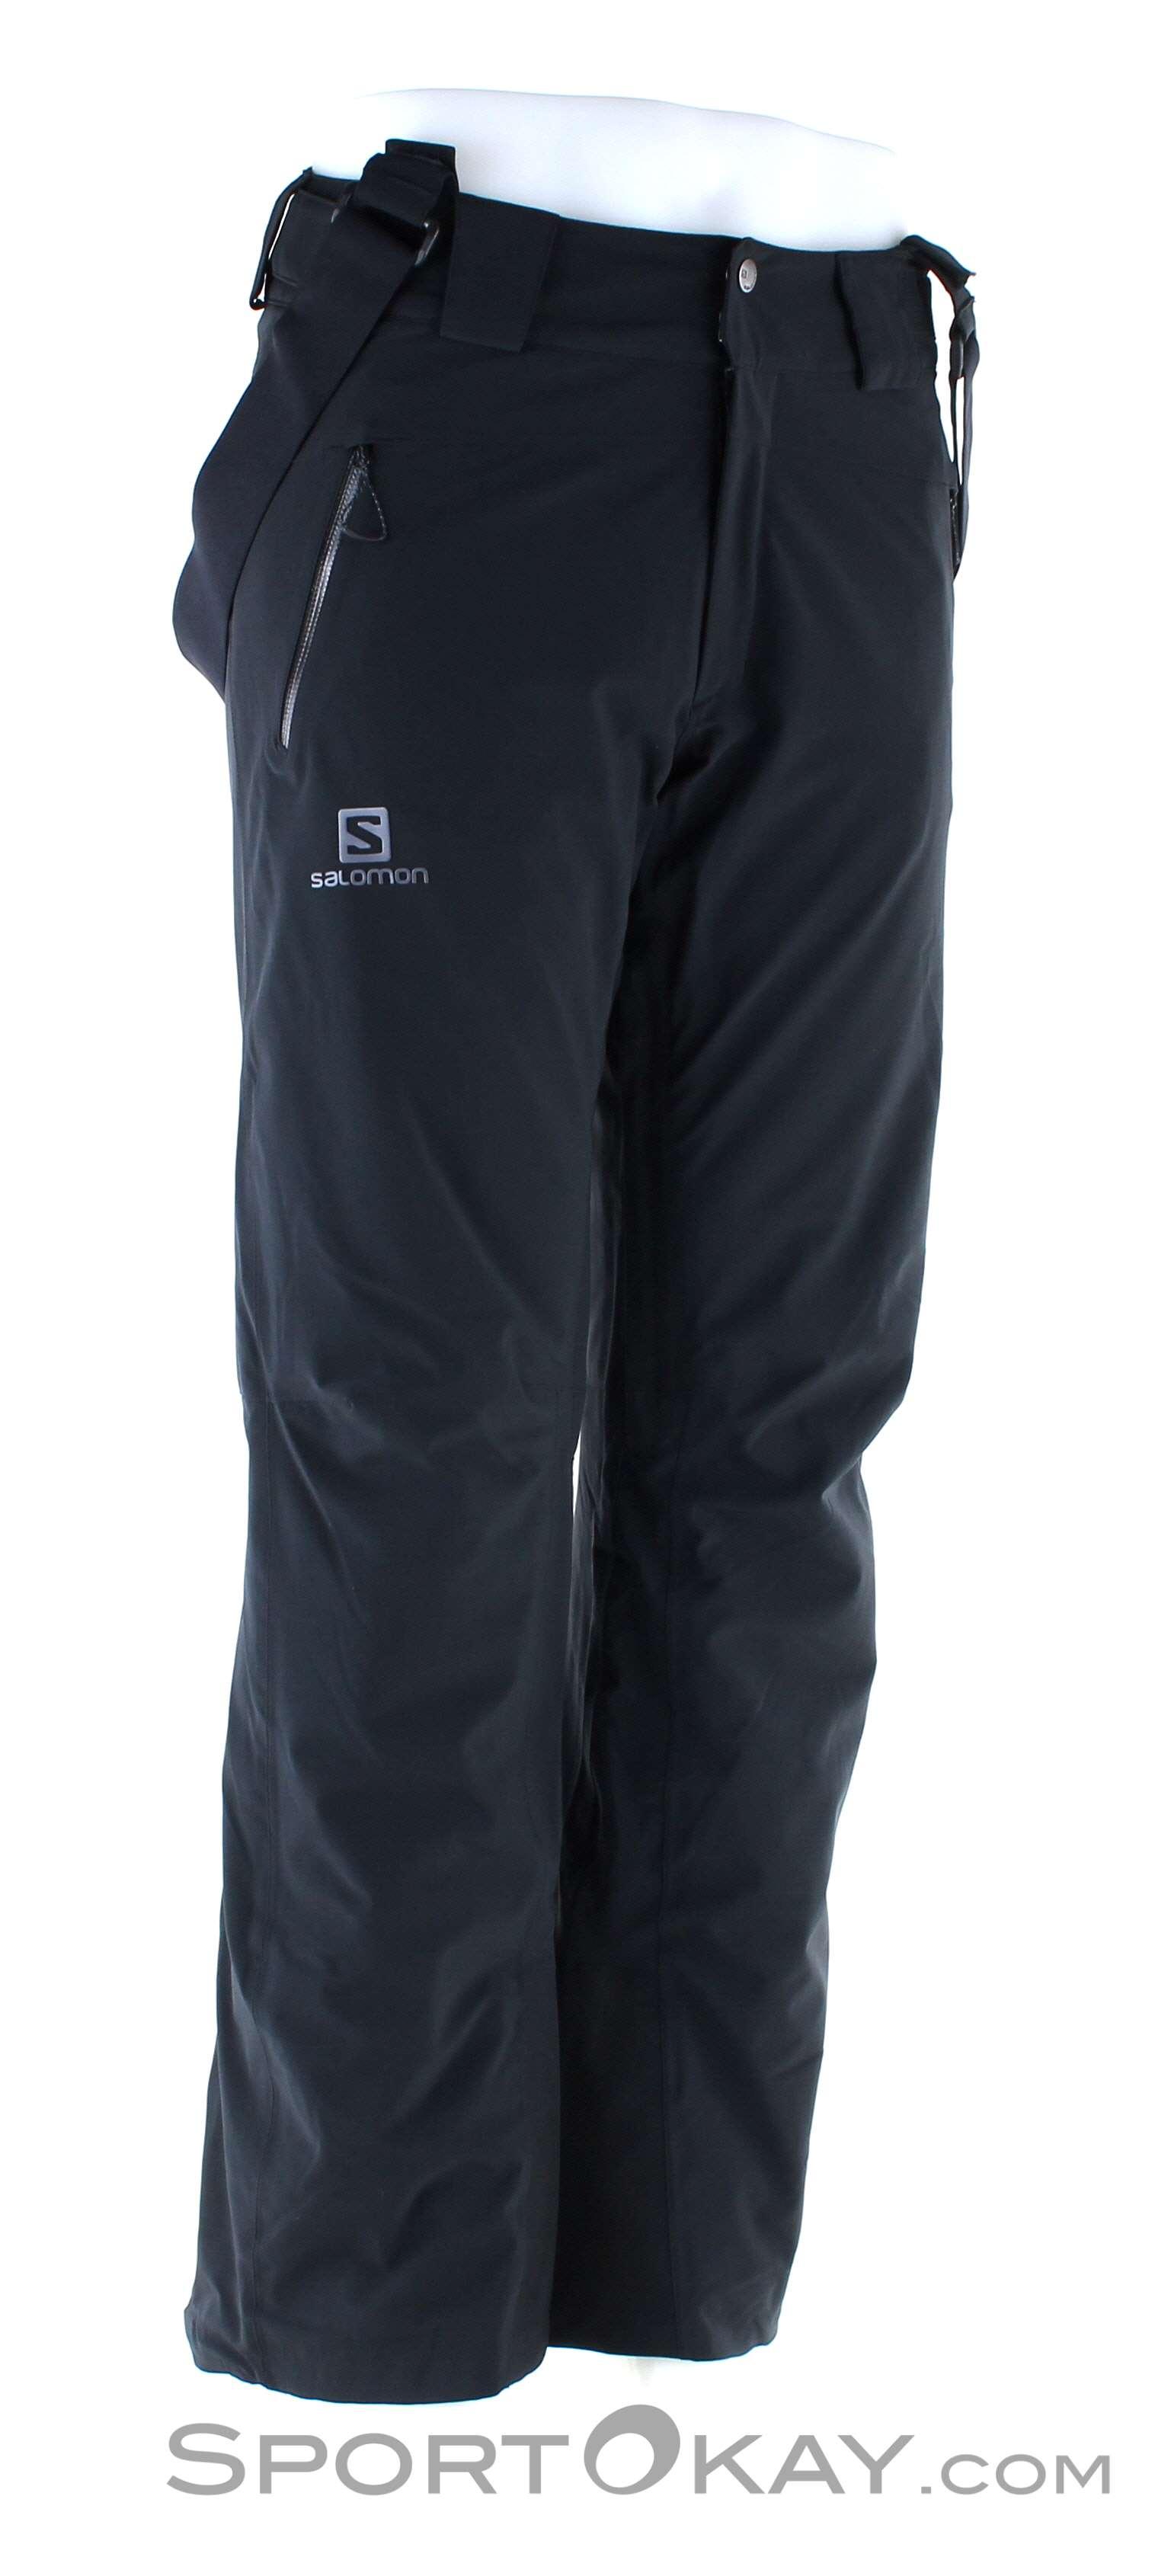 Salomon Salomon Iceglory Pant Mens Ski Pants Long Cut